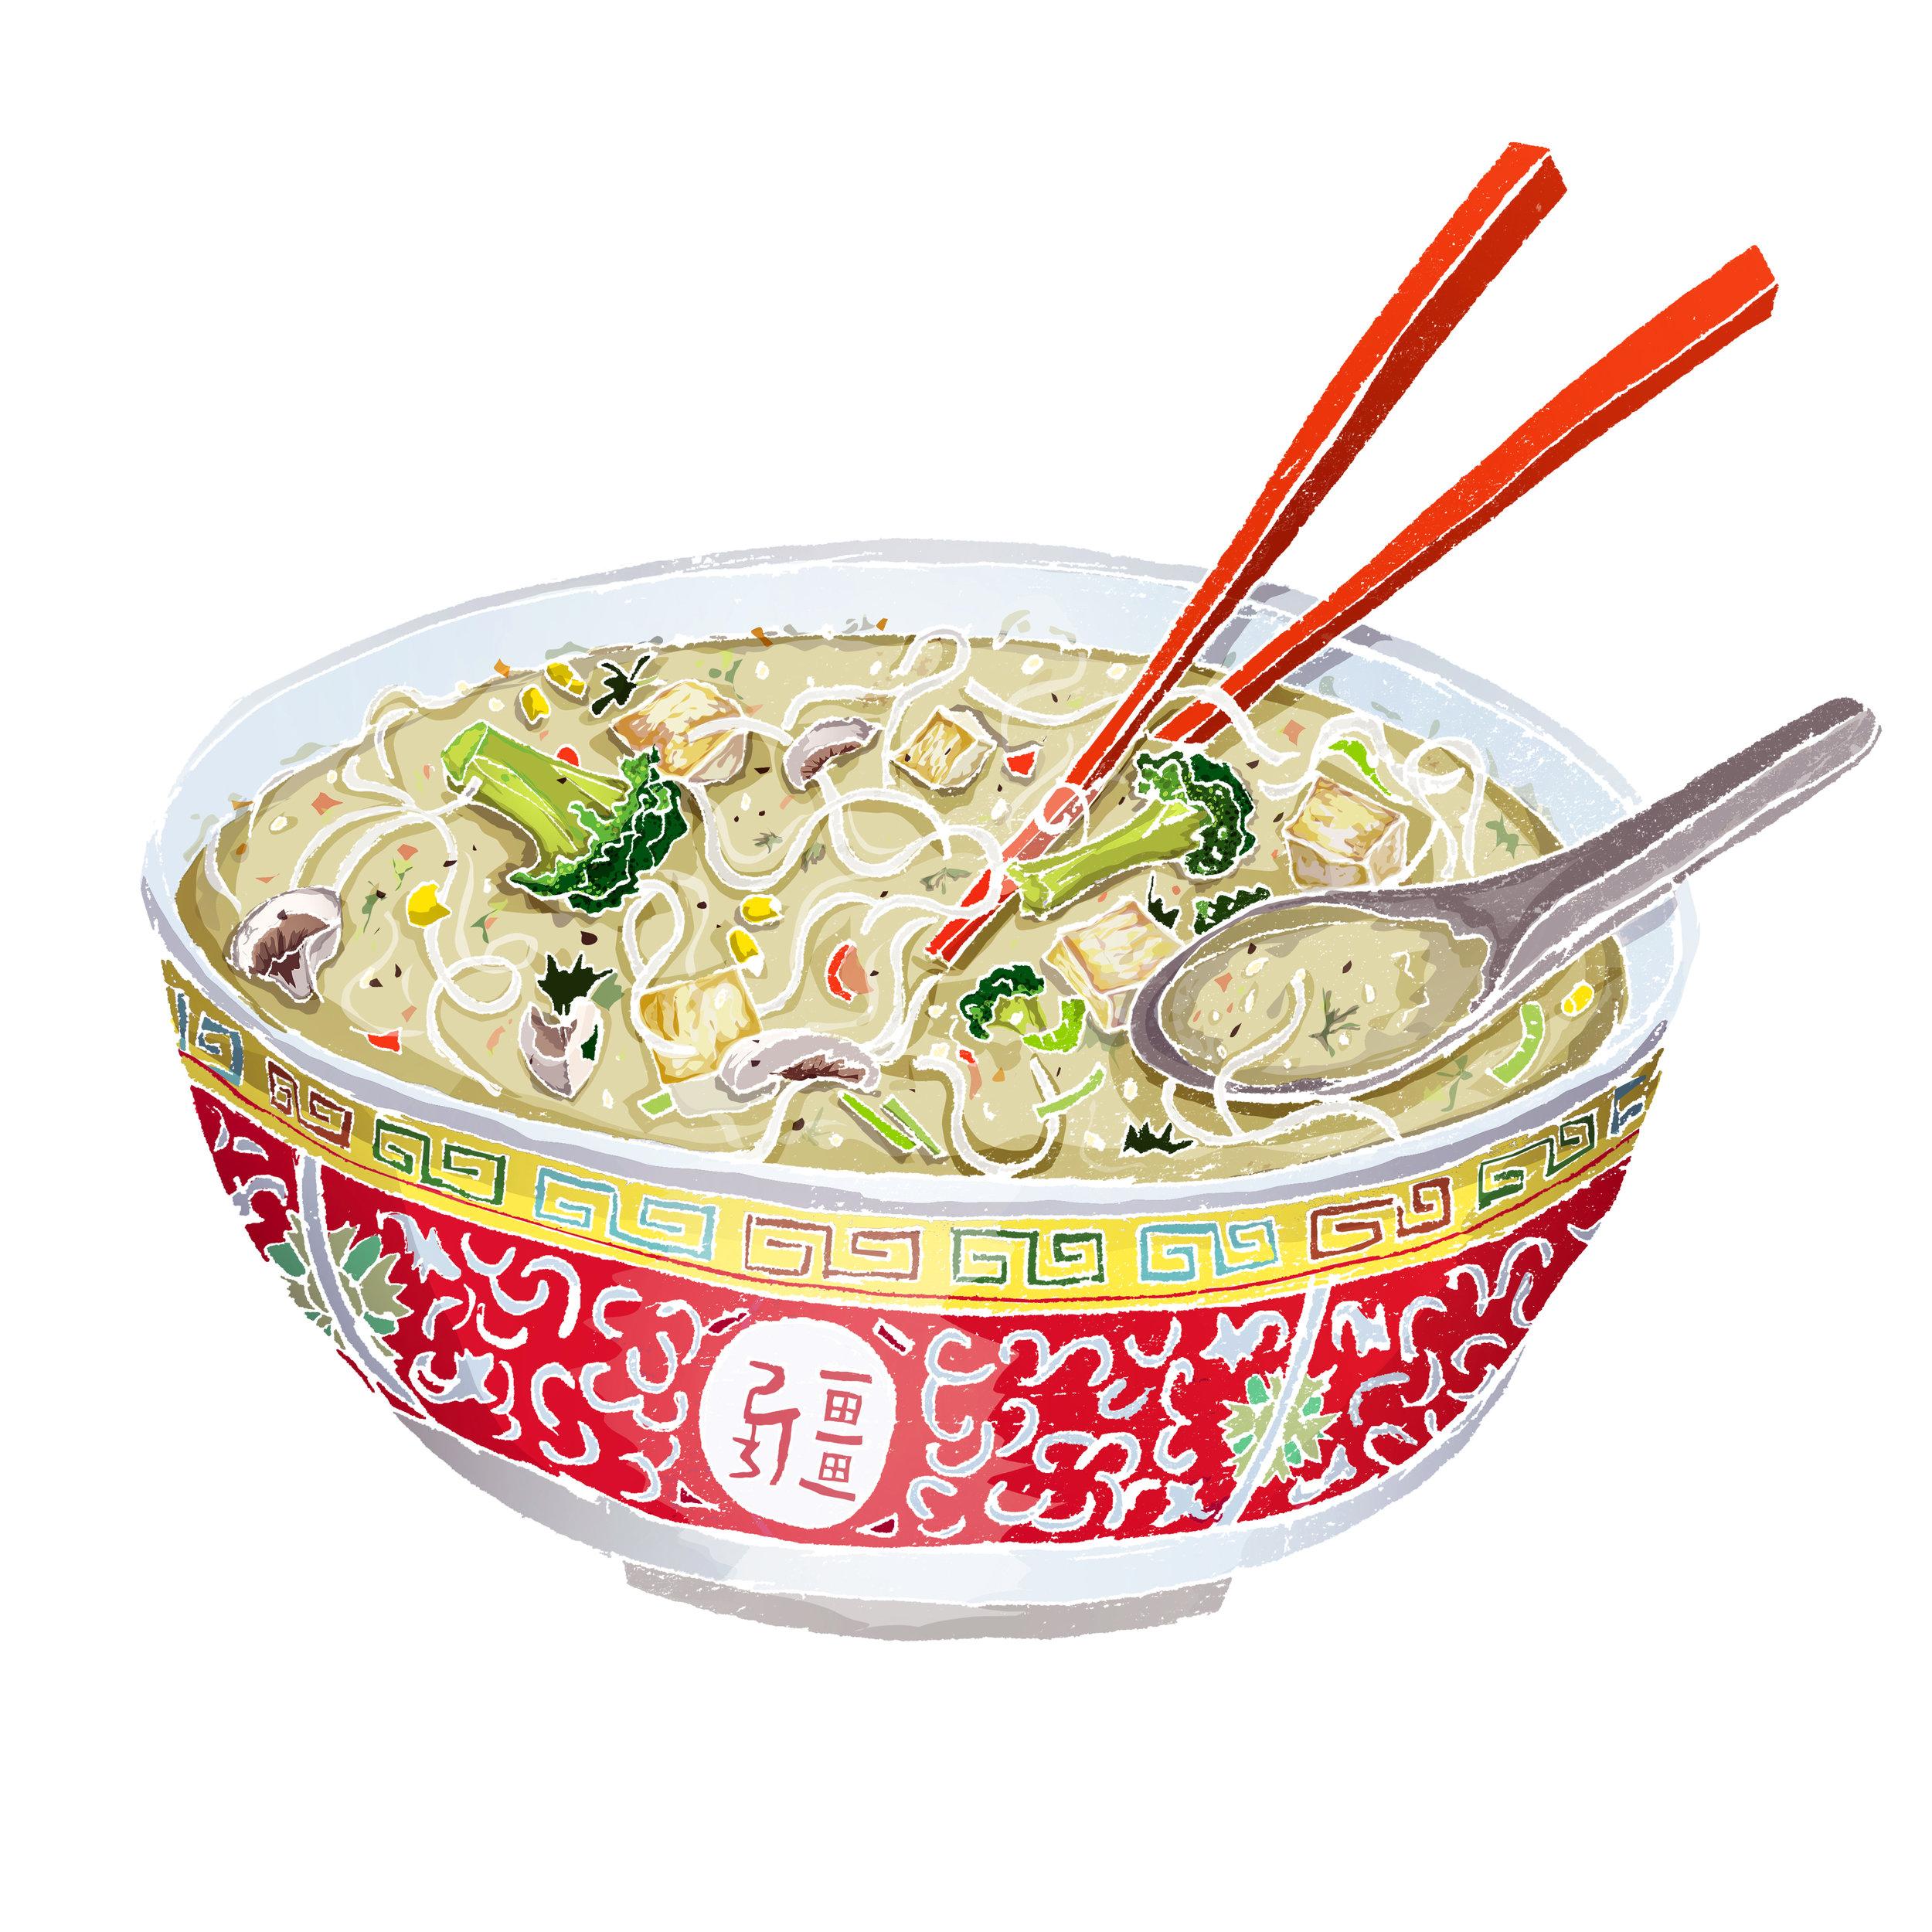 Homemade veggie tofu soup